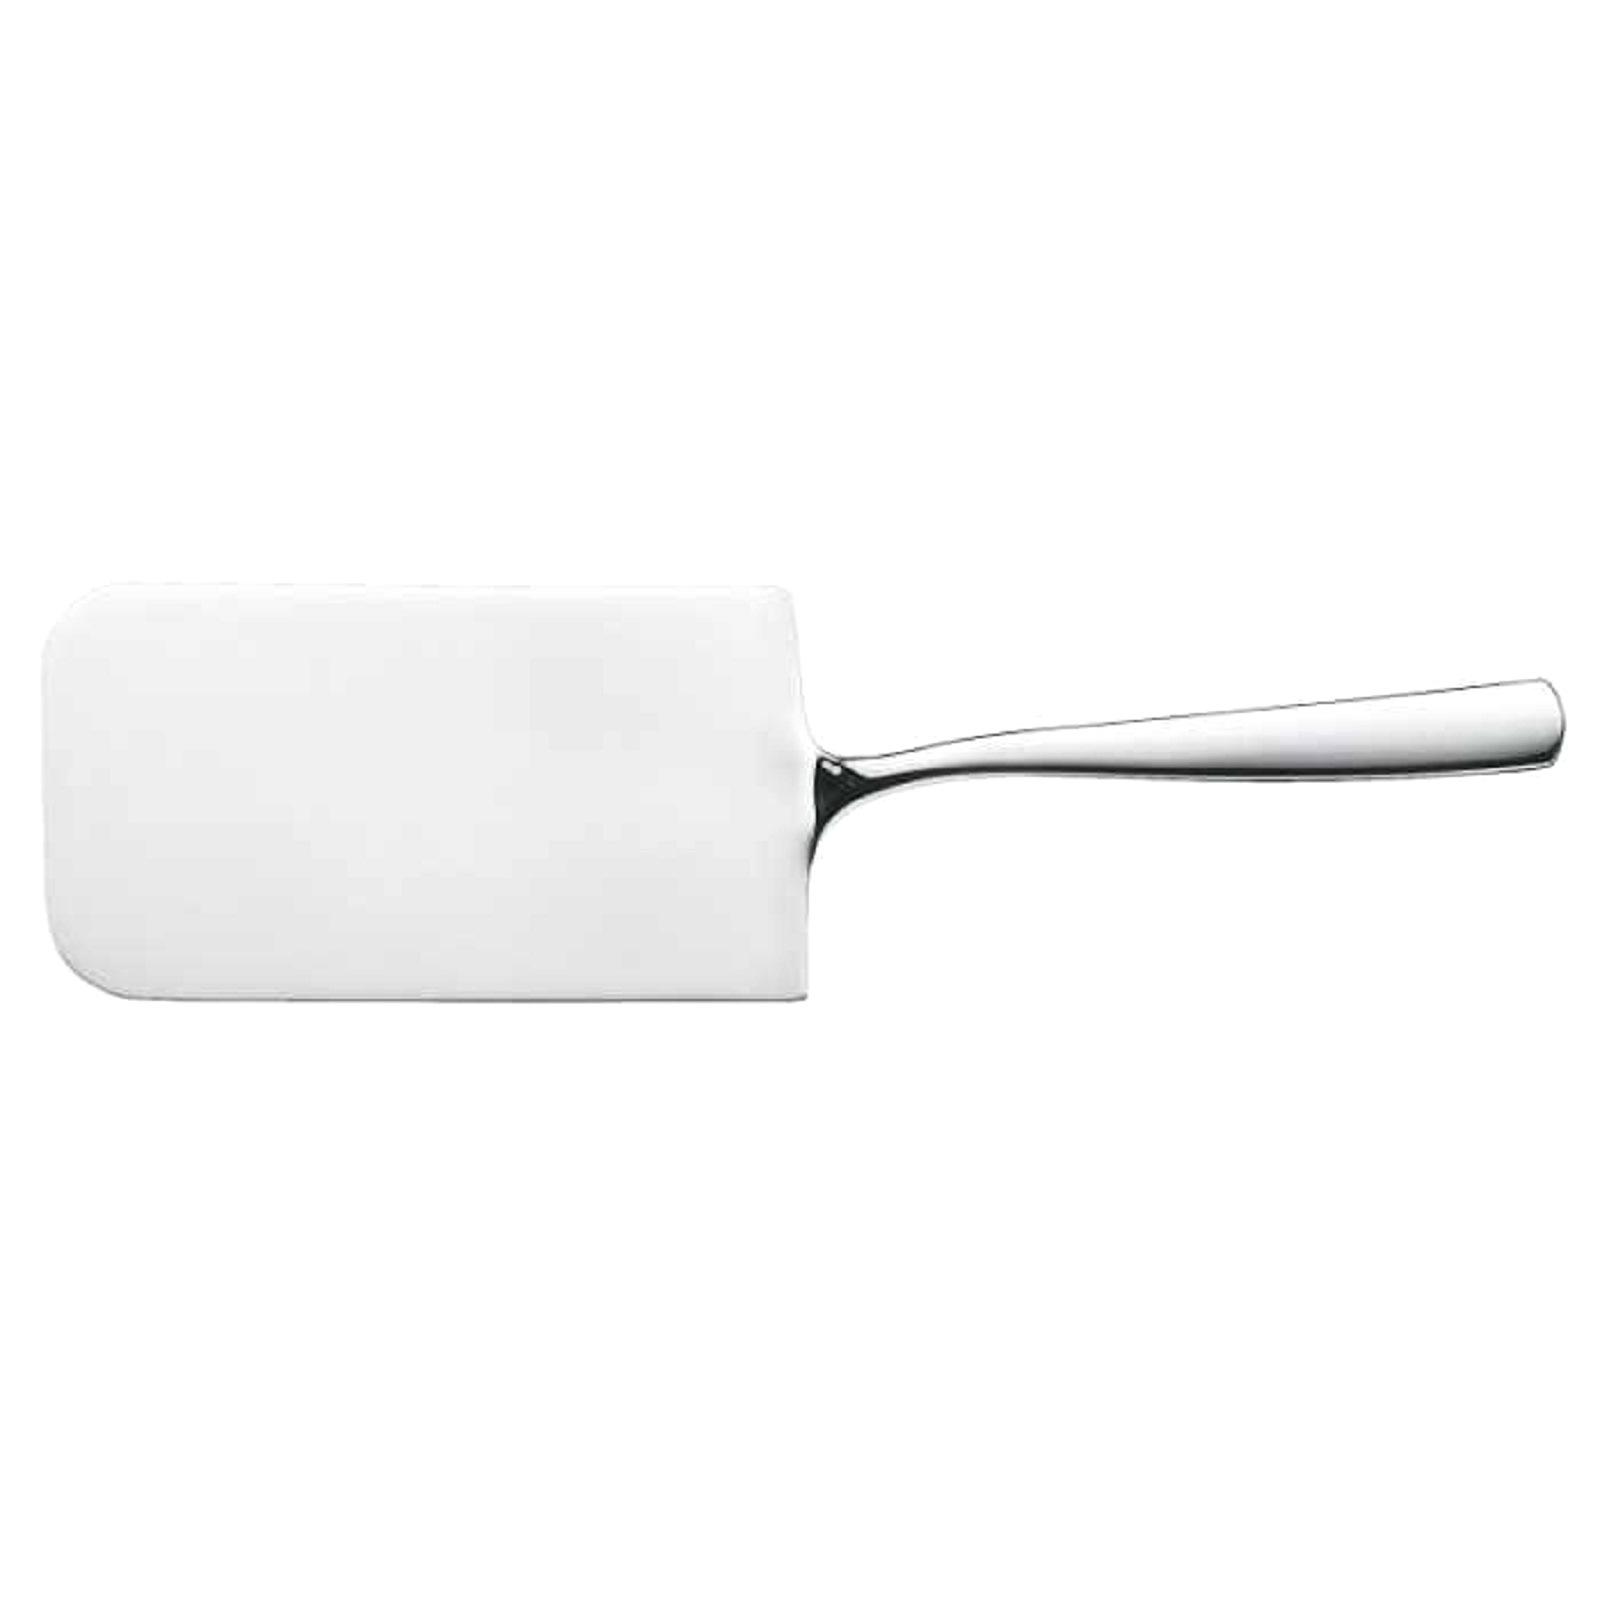 Онлайн каталог PROMENU: Лопатка WMF BISTRO, длина 25 см, серебристый WMF 12 8863 6040